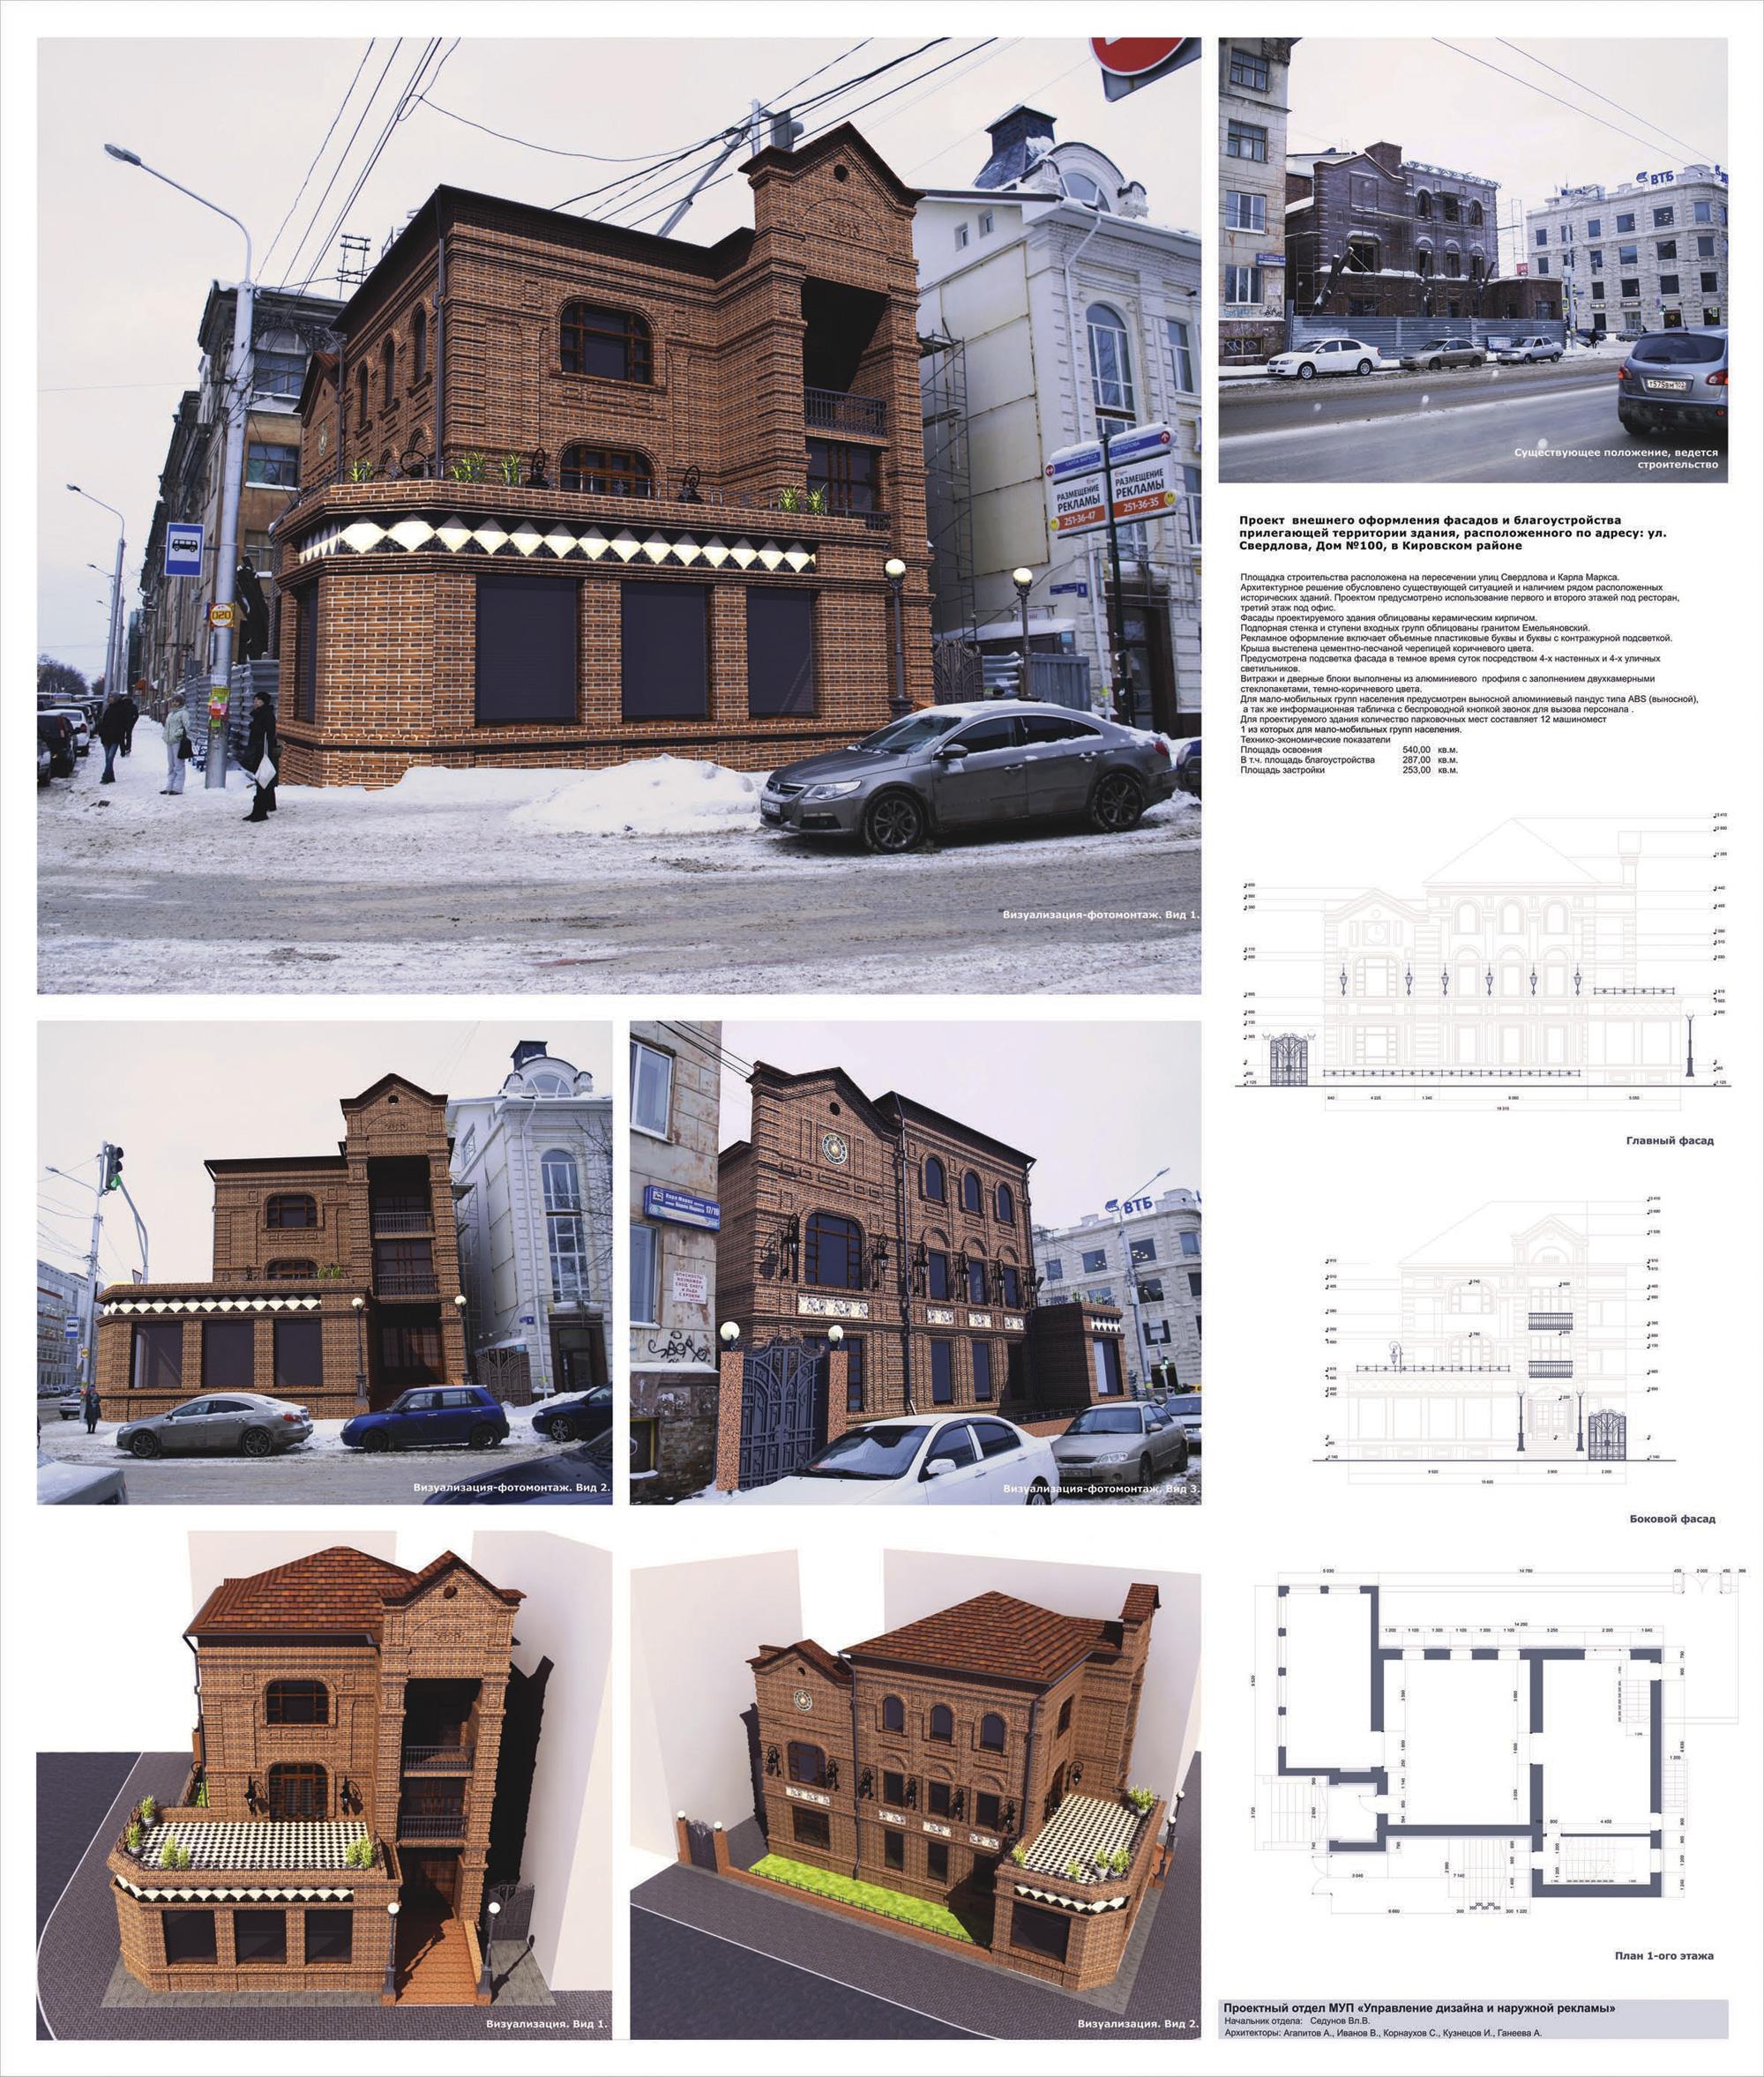 Проект оформления фасадов здания ресторана по ул Свердлова  Проект оформления фасадов здания ресторана по ул Свердлова 100 Уфа